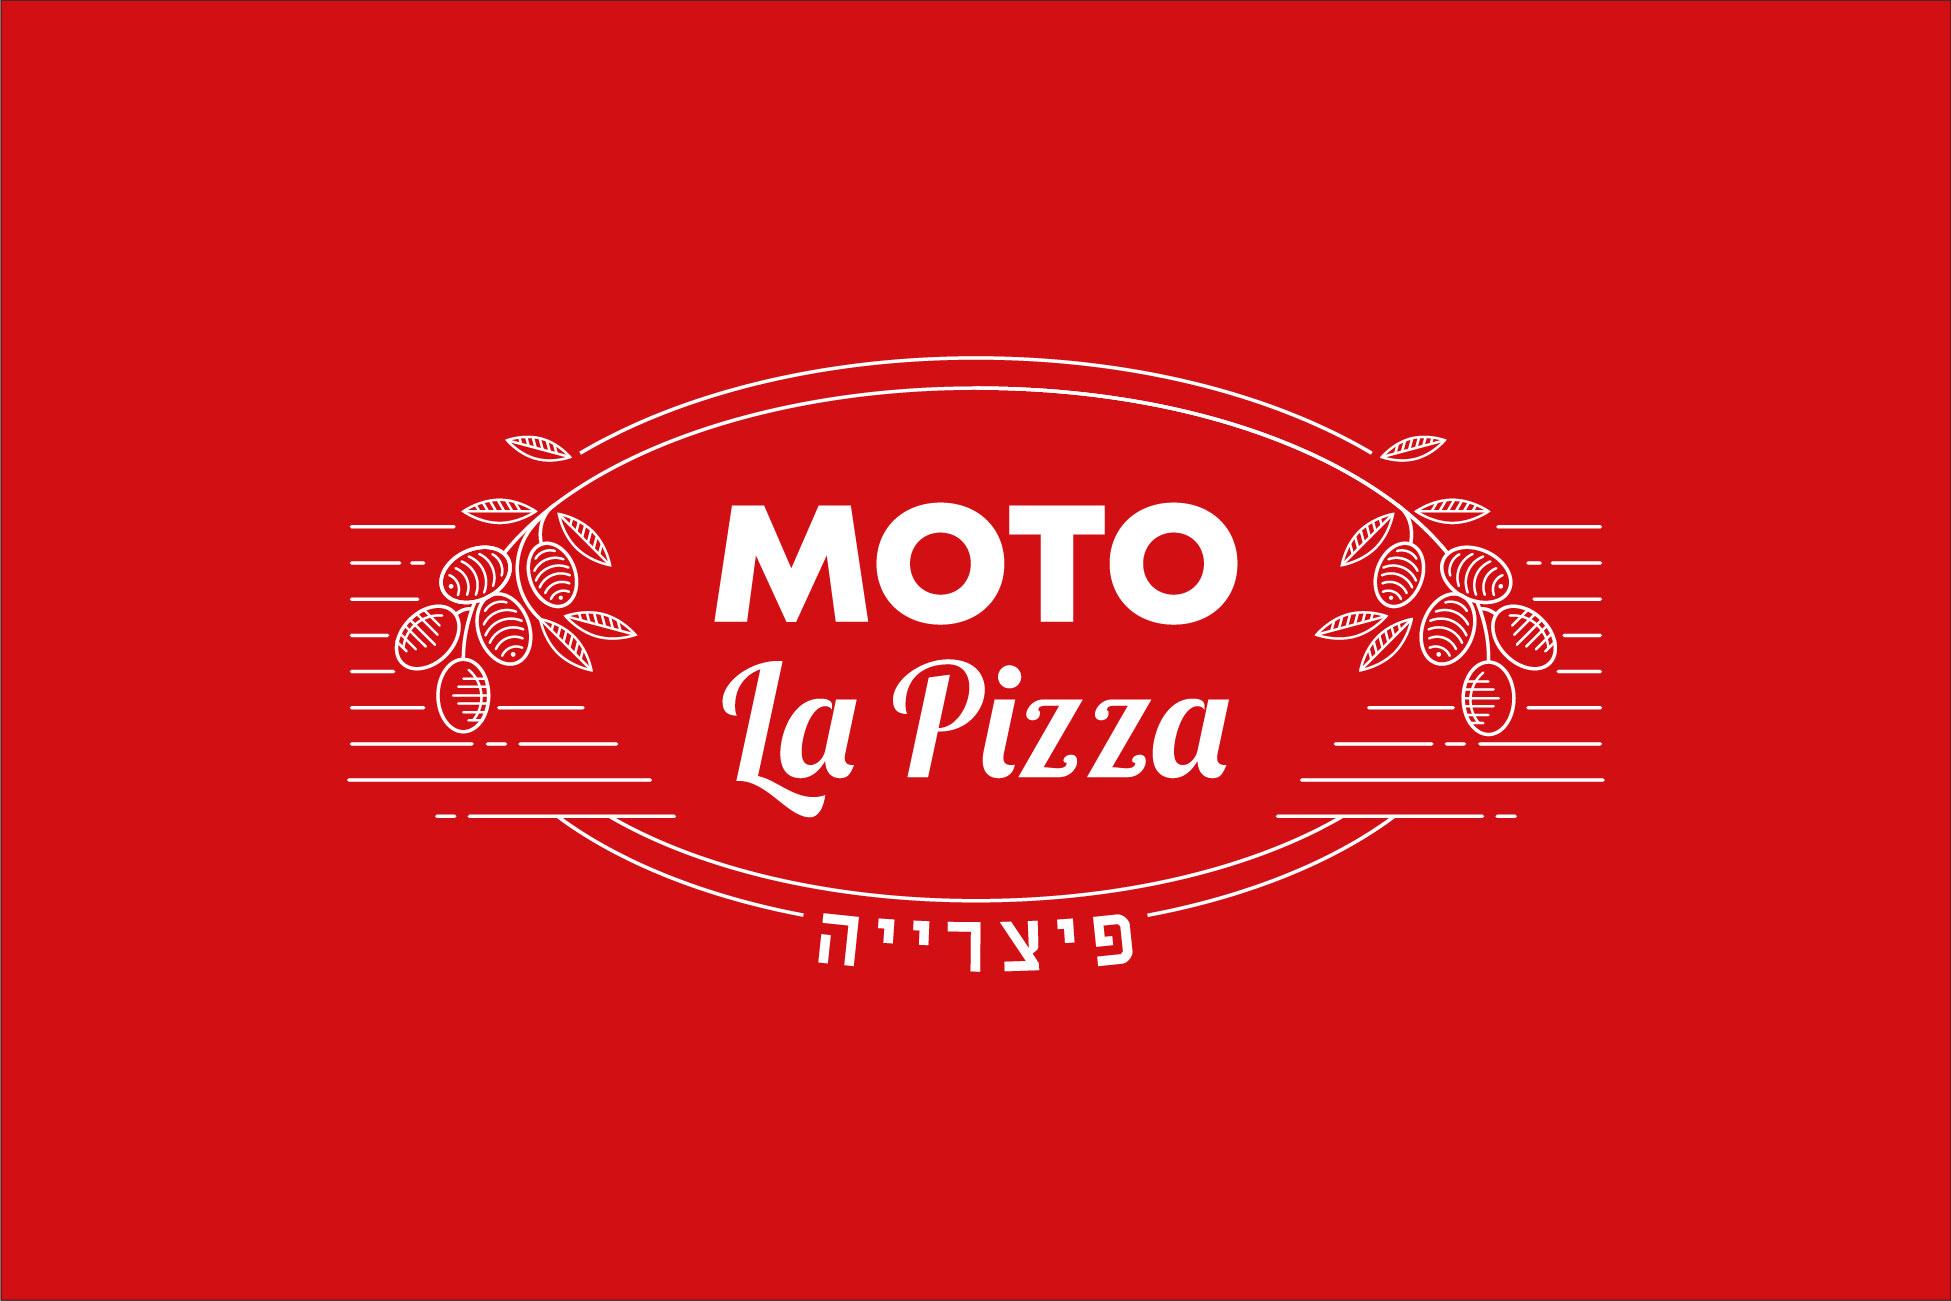 01_Moto.jpg